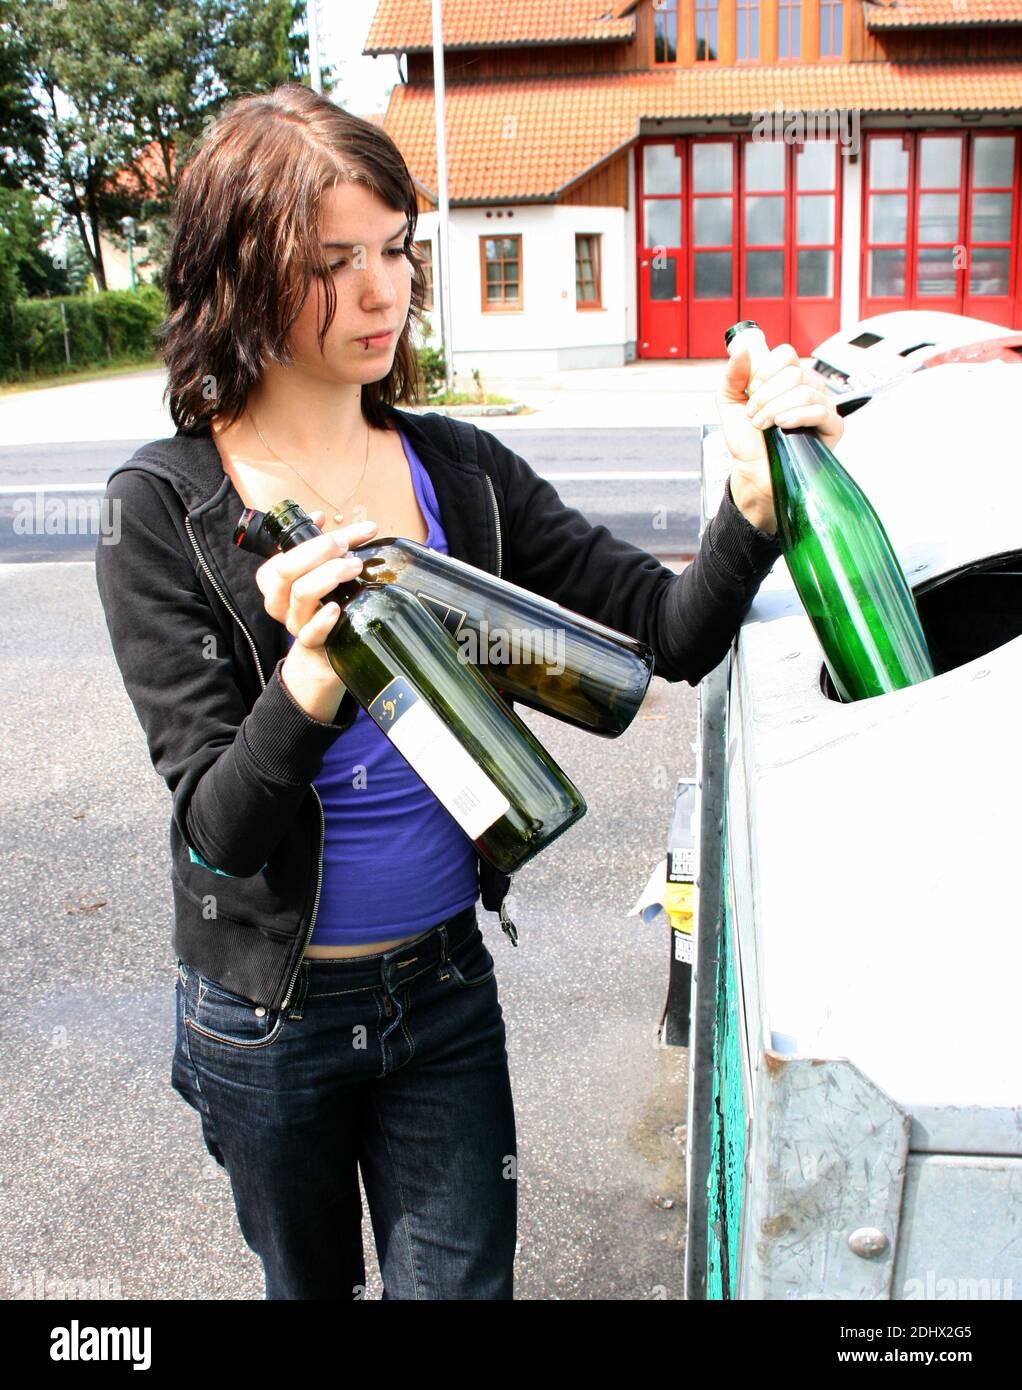 Frau entsorgt Altglas im Container, MR: Yes Stock Photo